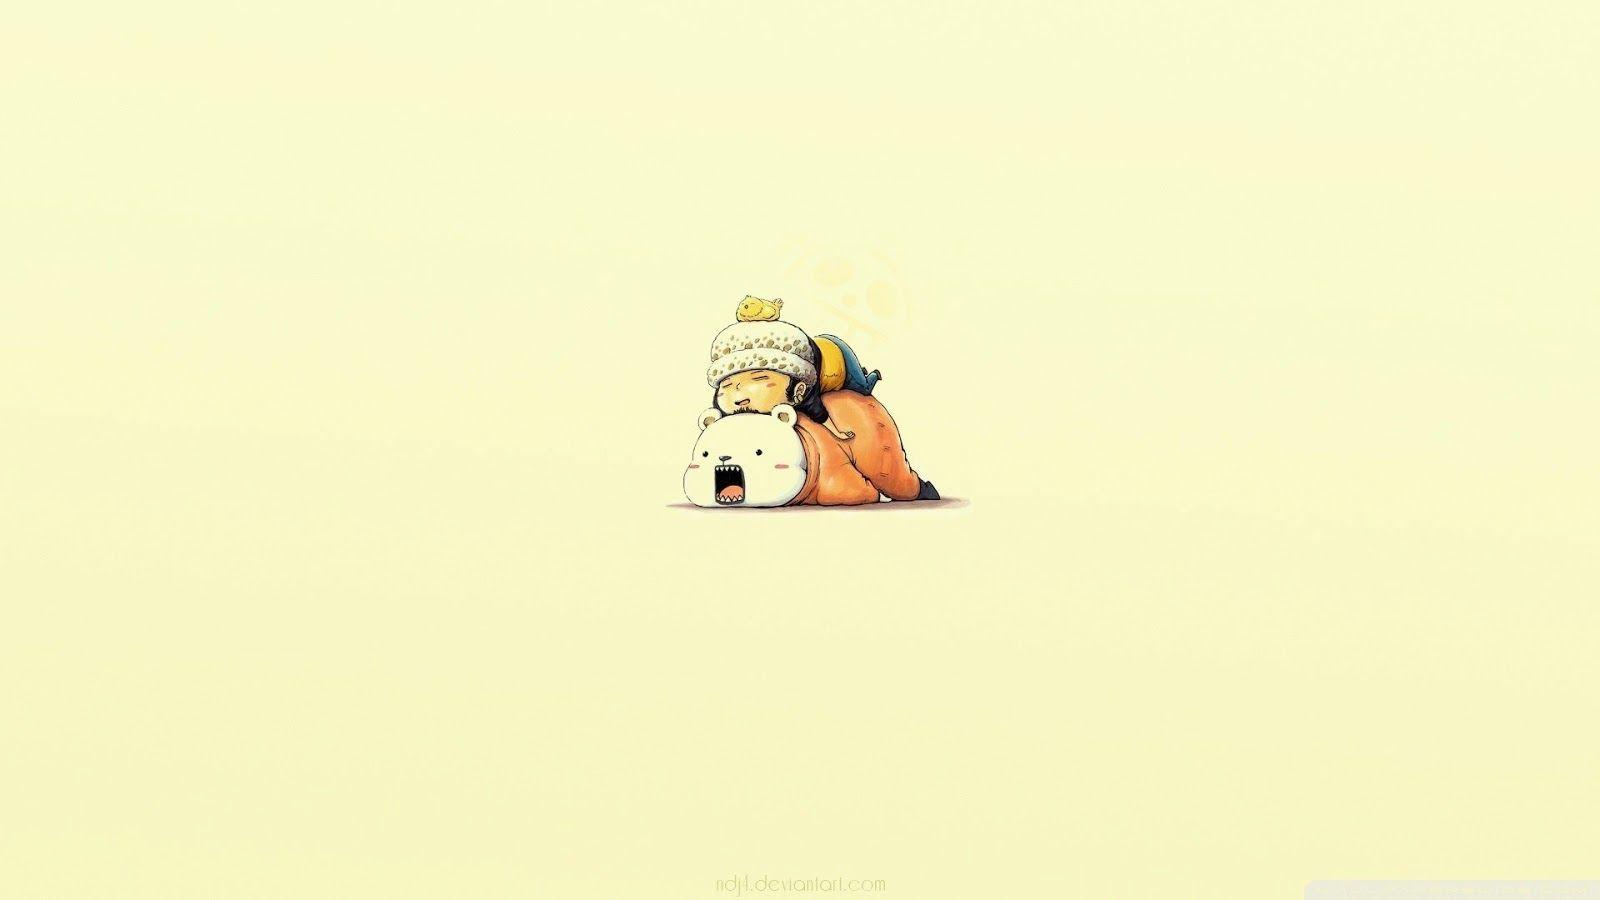 Bepo Law Sleeping Anime Chibi One Piece Hd Wallpaper Desktop Background Sleeping Cute Simple Wallpapers Anime Wallpaper Trafalgar Law Wallpapers